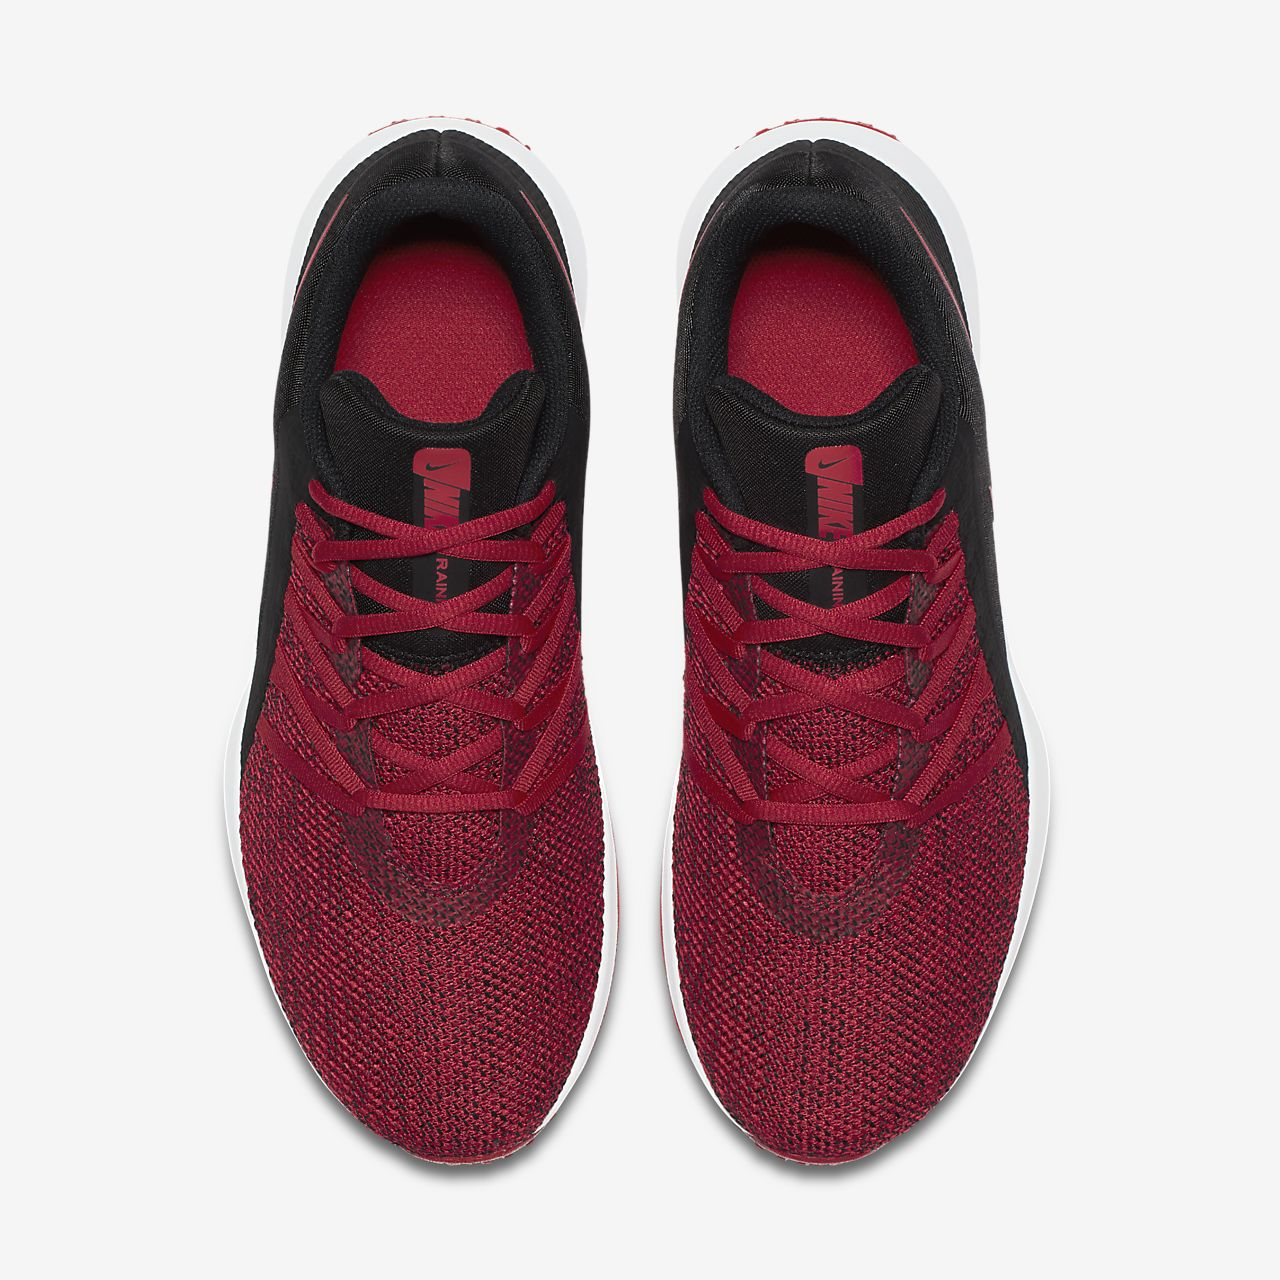 nike free tr v8 men's training shoe nz